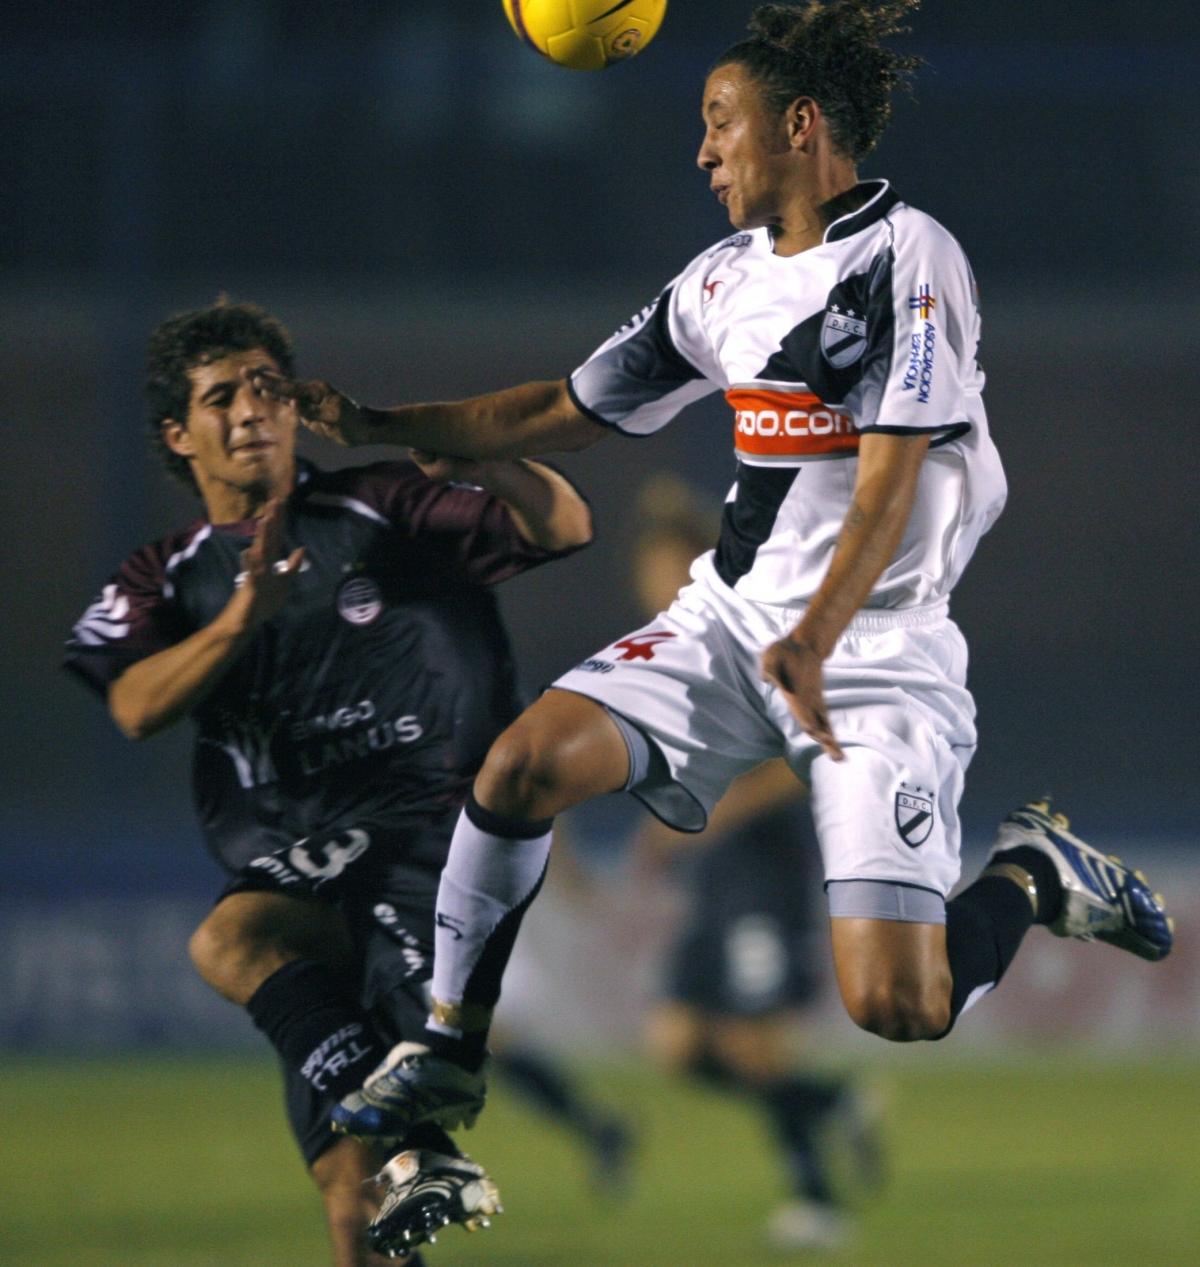 Jorge Garcia